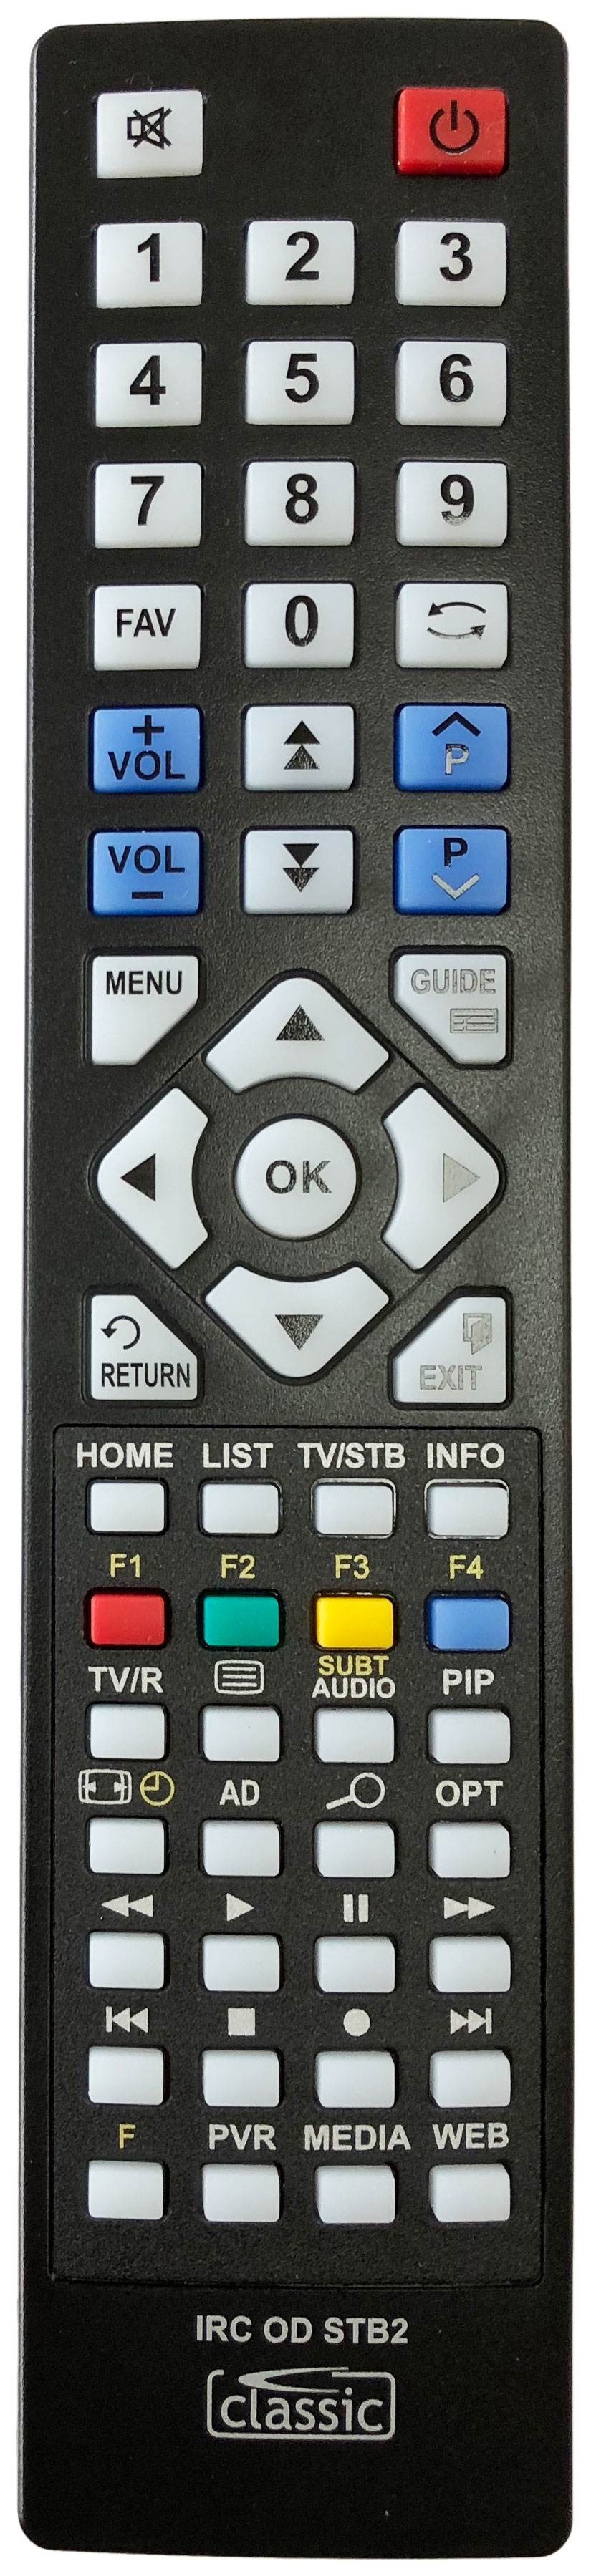 TVONICS DVR-FP150 Remote Control